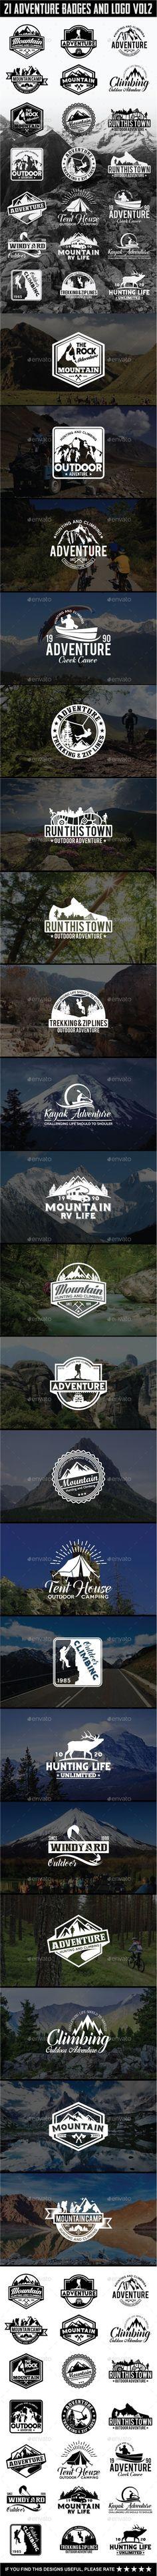 21 Adventure Badges and Logo Vol2 - Badges & Stickers Web Elements